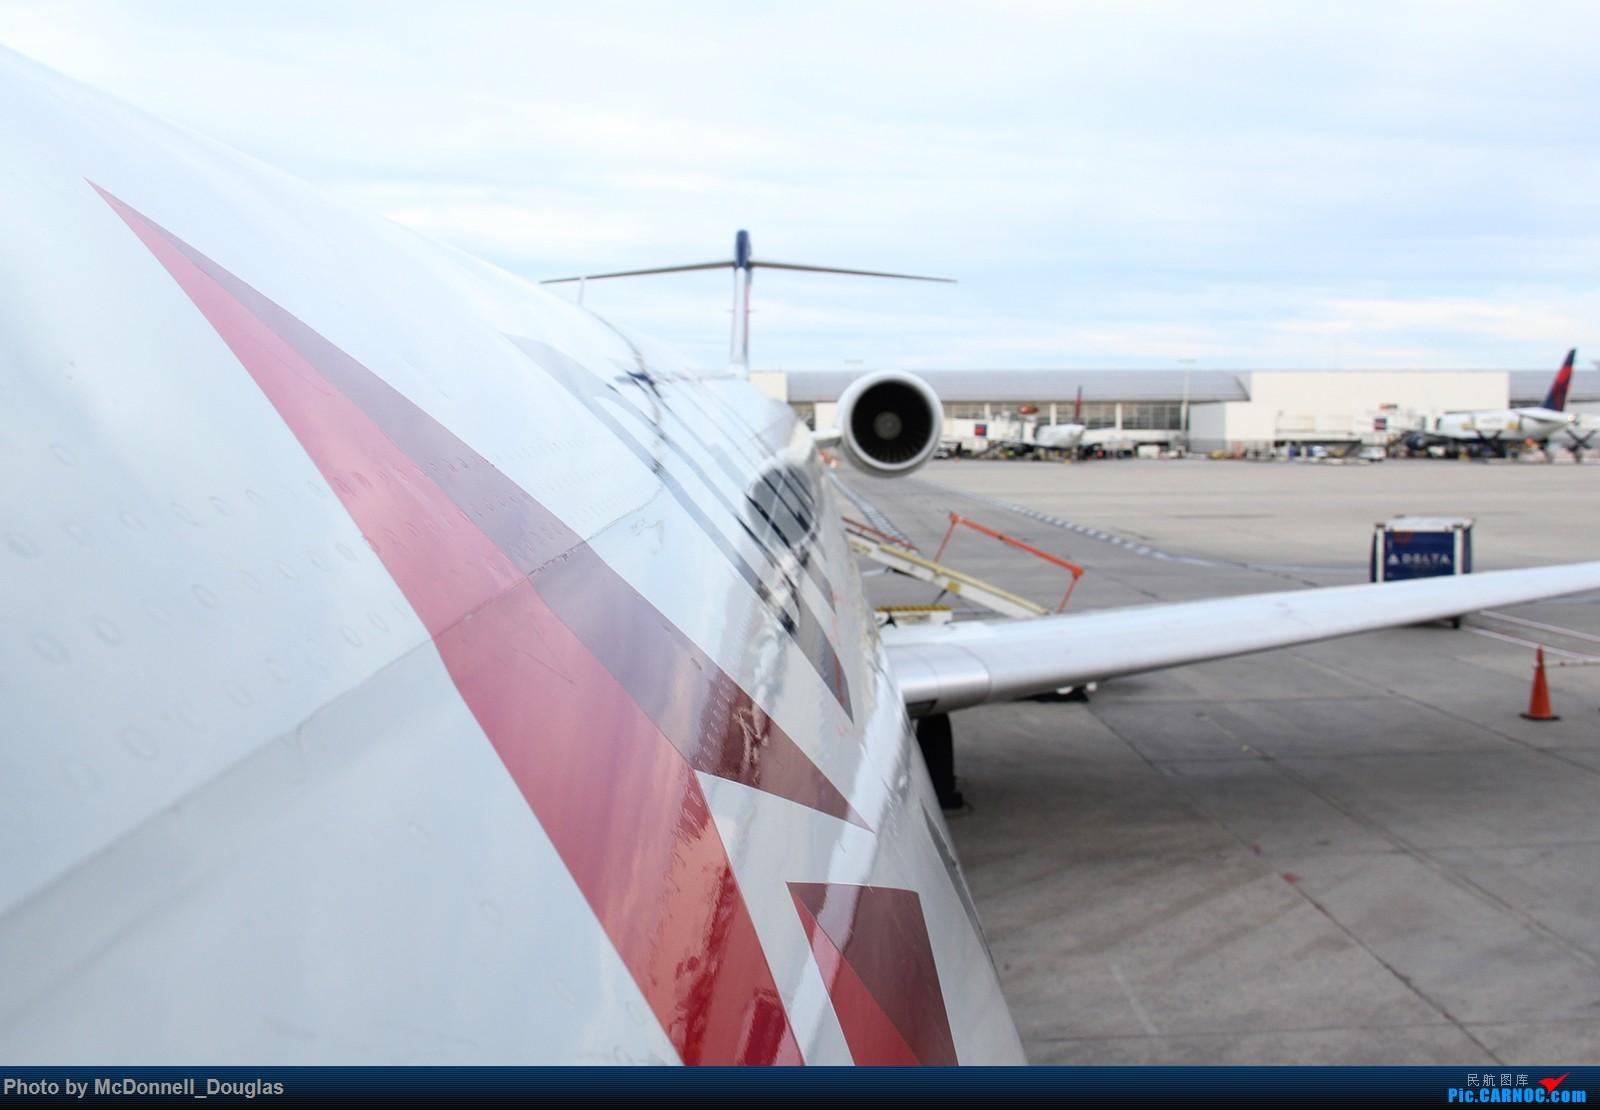 Re:[原创]【上海飞友会】图会很多,也有很多驾驶舱,杂七杂八的美帝,梦寐以求的圣马丁,这更绝不弃贴,前十个id砸飞机砸一个返一个【驾驶舱已出现】 CANADAIR CL-602-2D24 REGIONAL JET CRJ-900LR N554CA 美国底特律都会韦恩郡机场